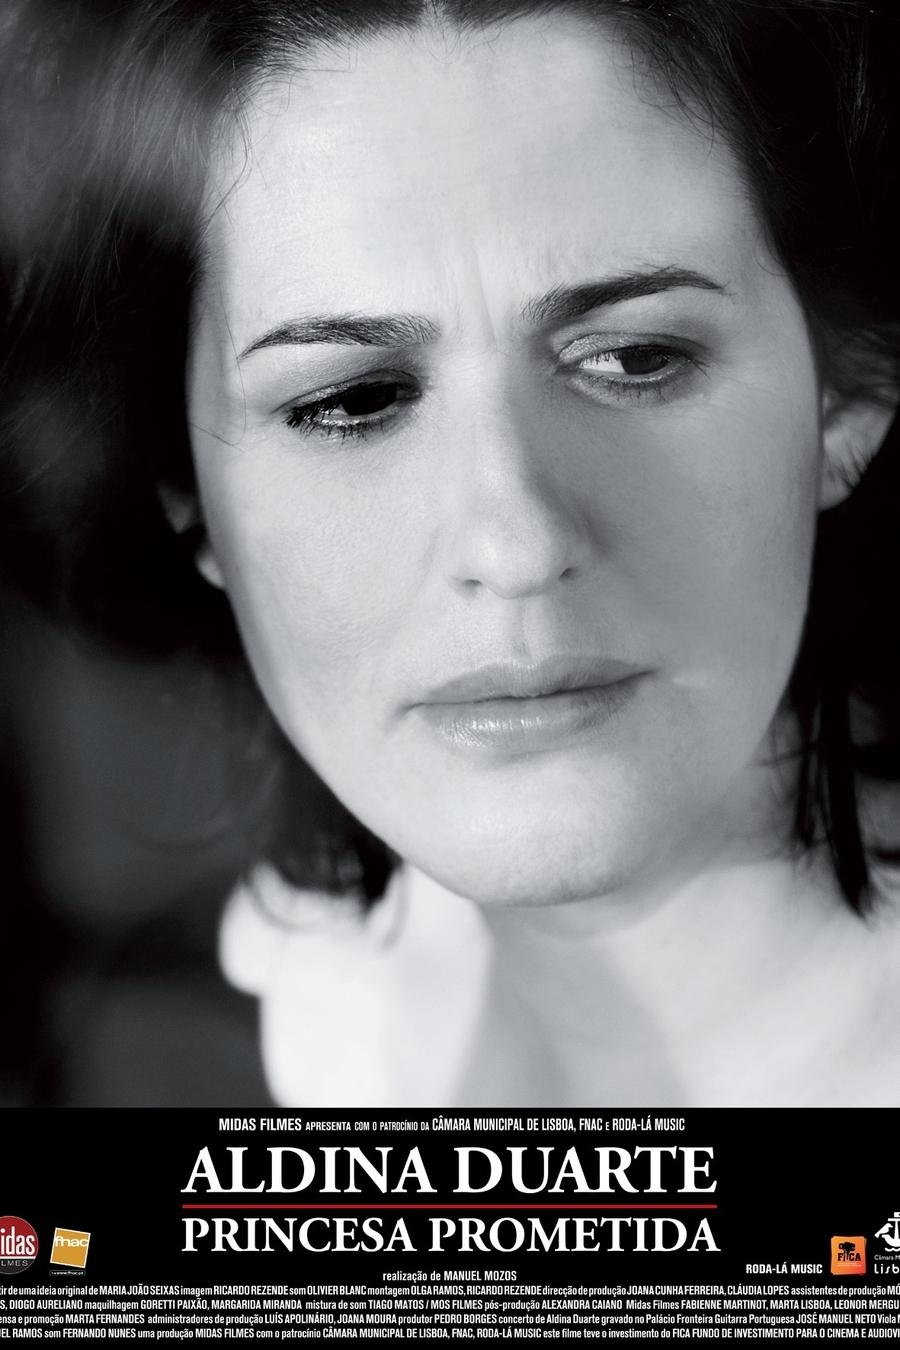 Aldina Duarte - Princesa Prometida